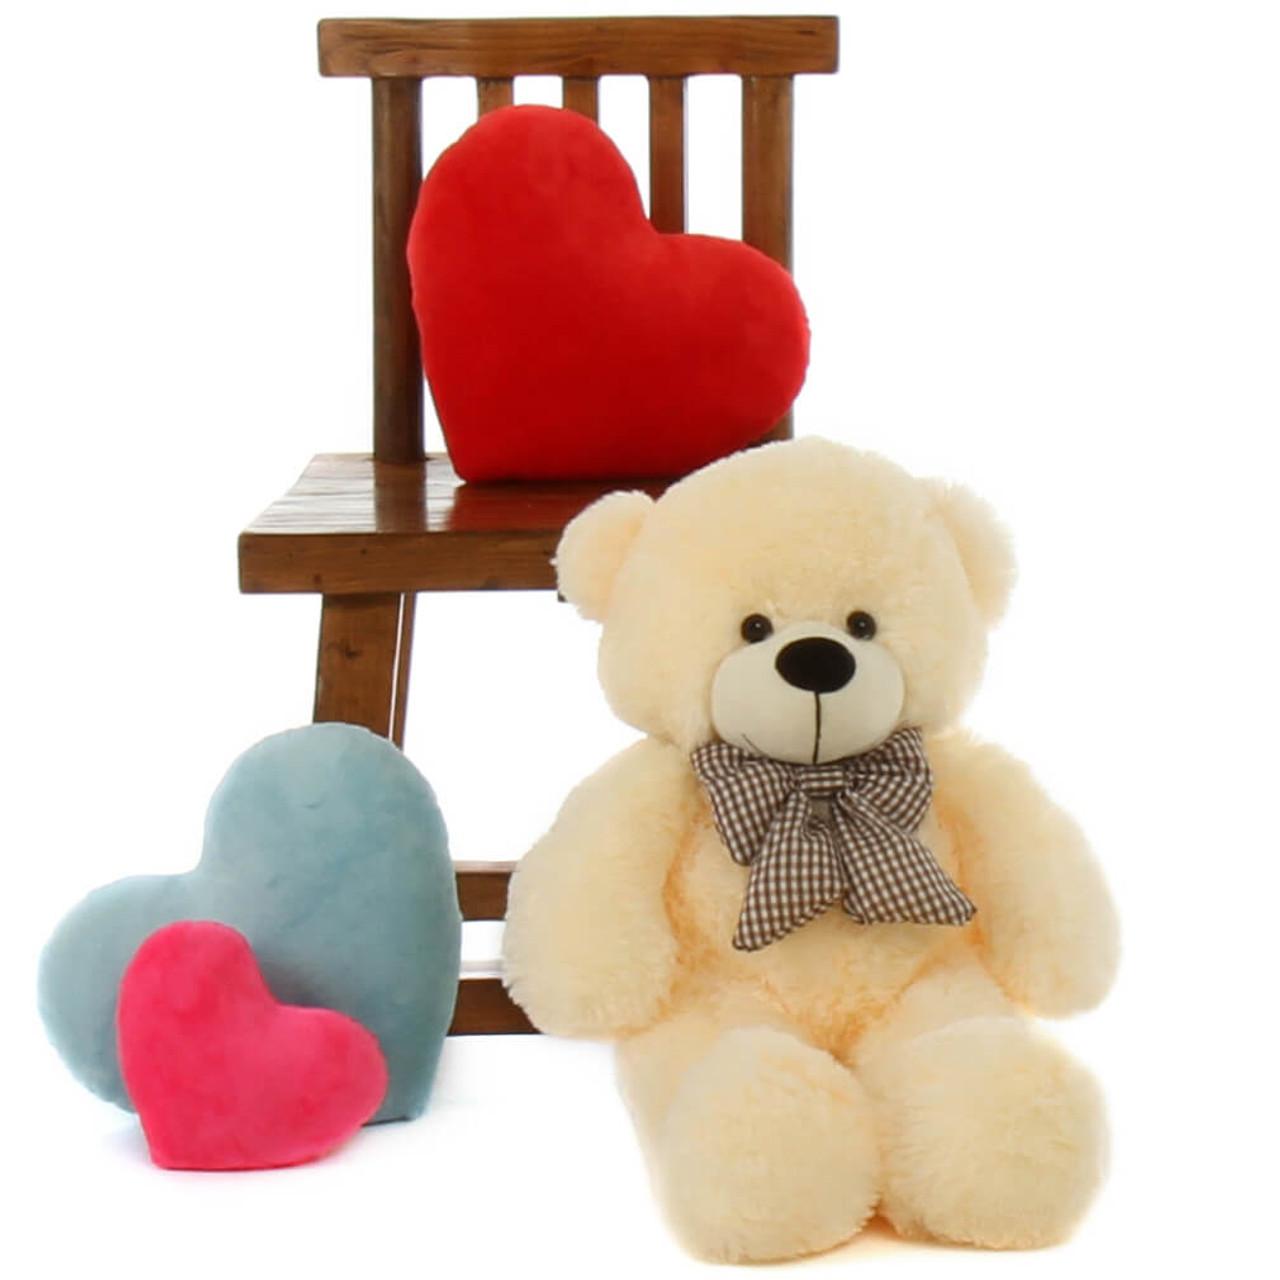 Creamy Vanilla 24in Teddy Bear Cozy Cuddles